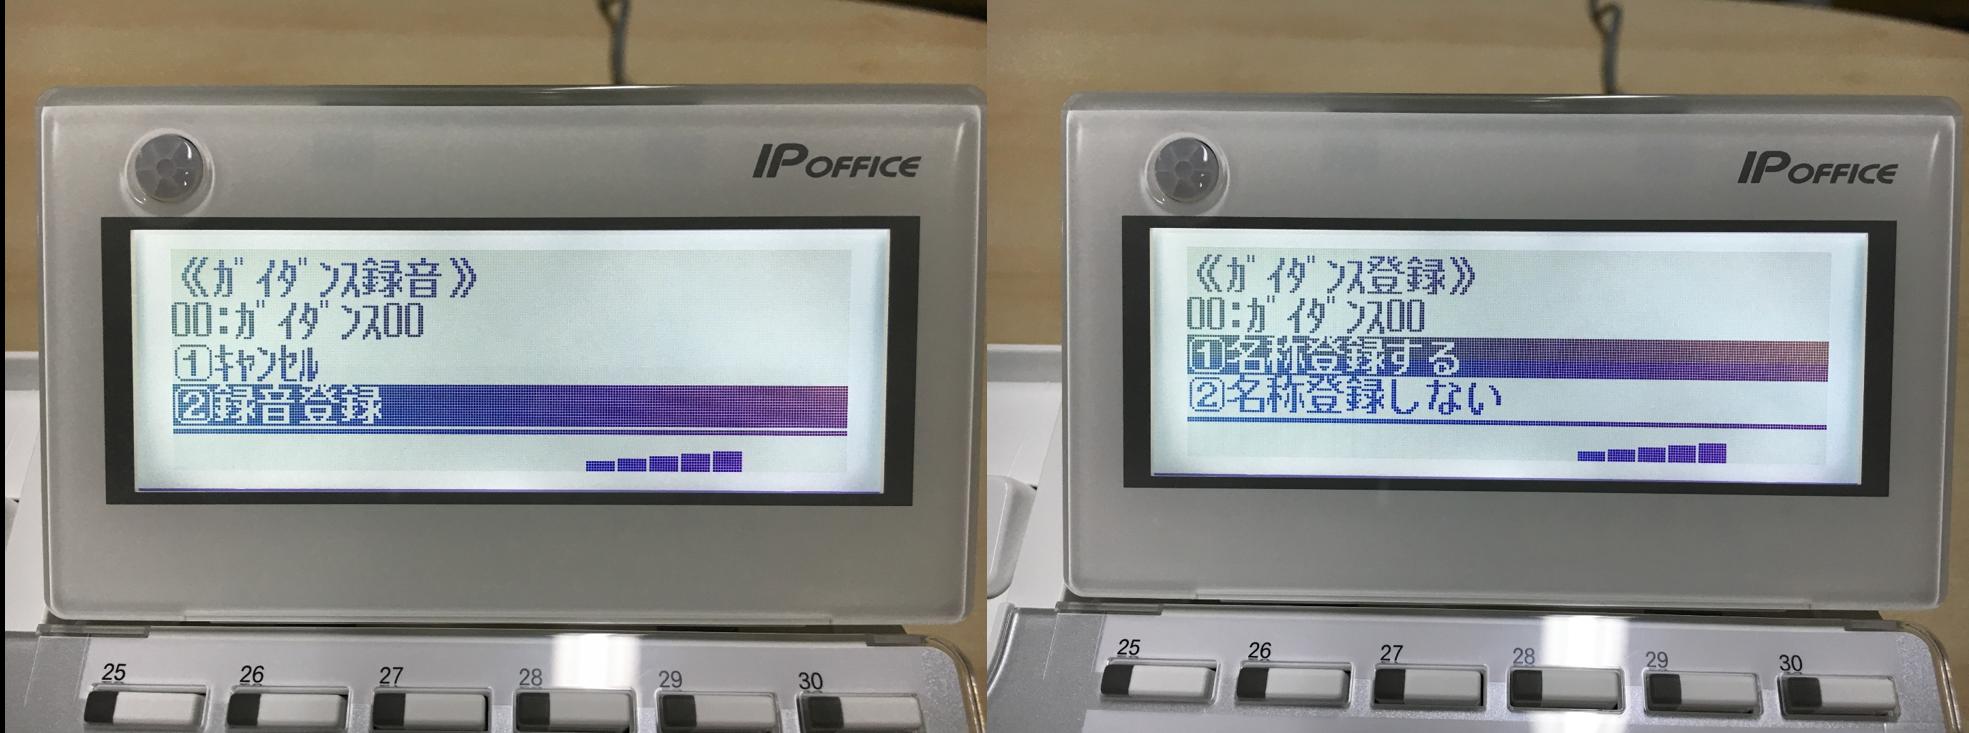 Panasonic_IP OFFICEⅡ_電話機_4